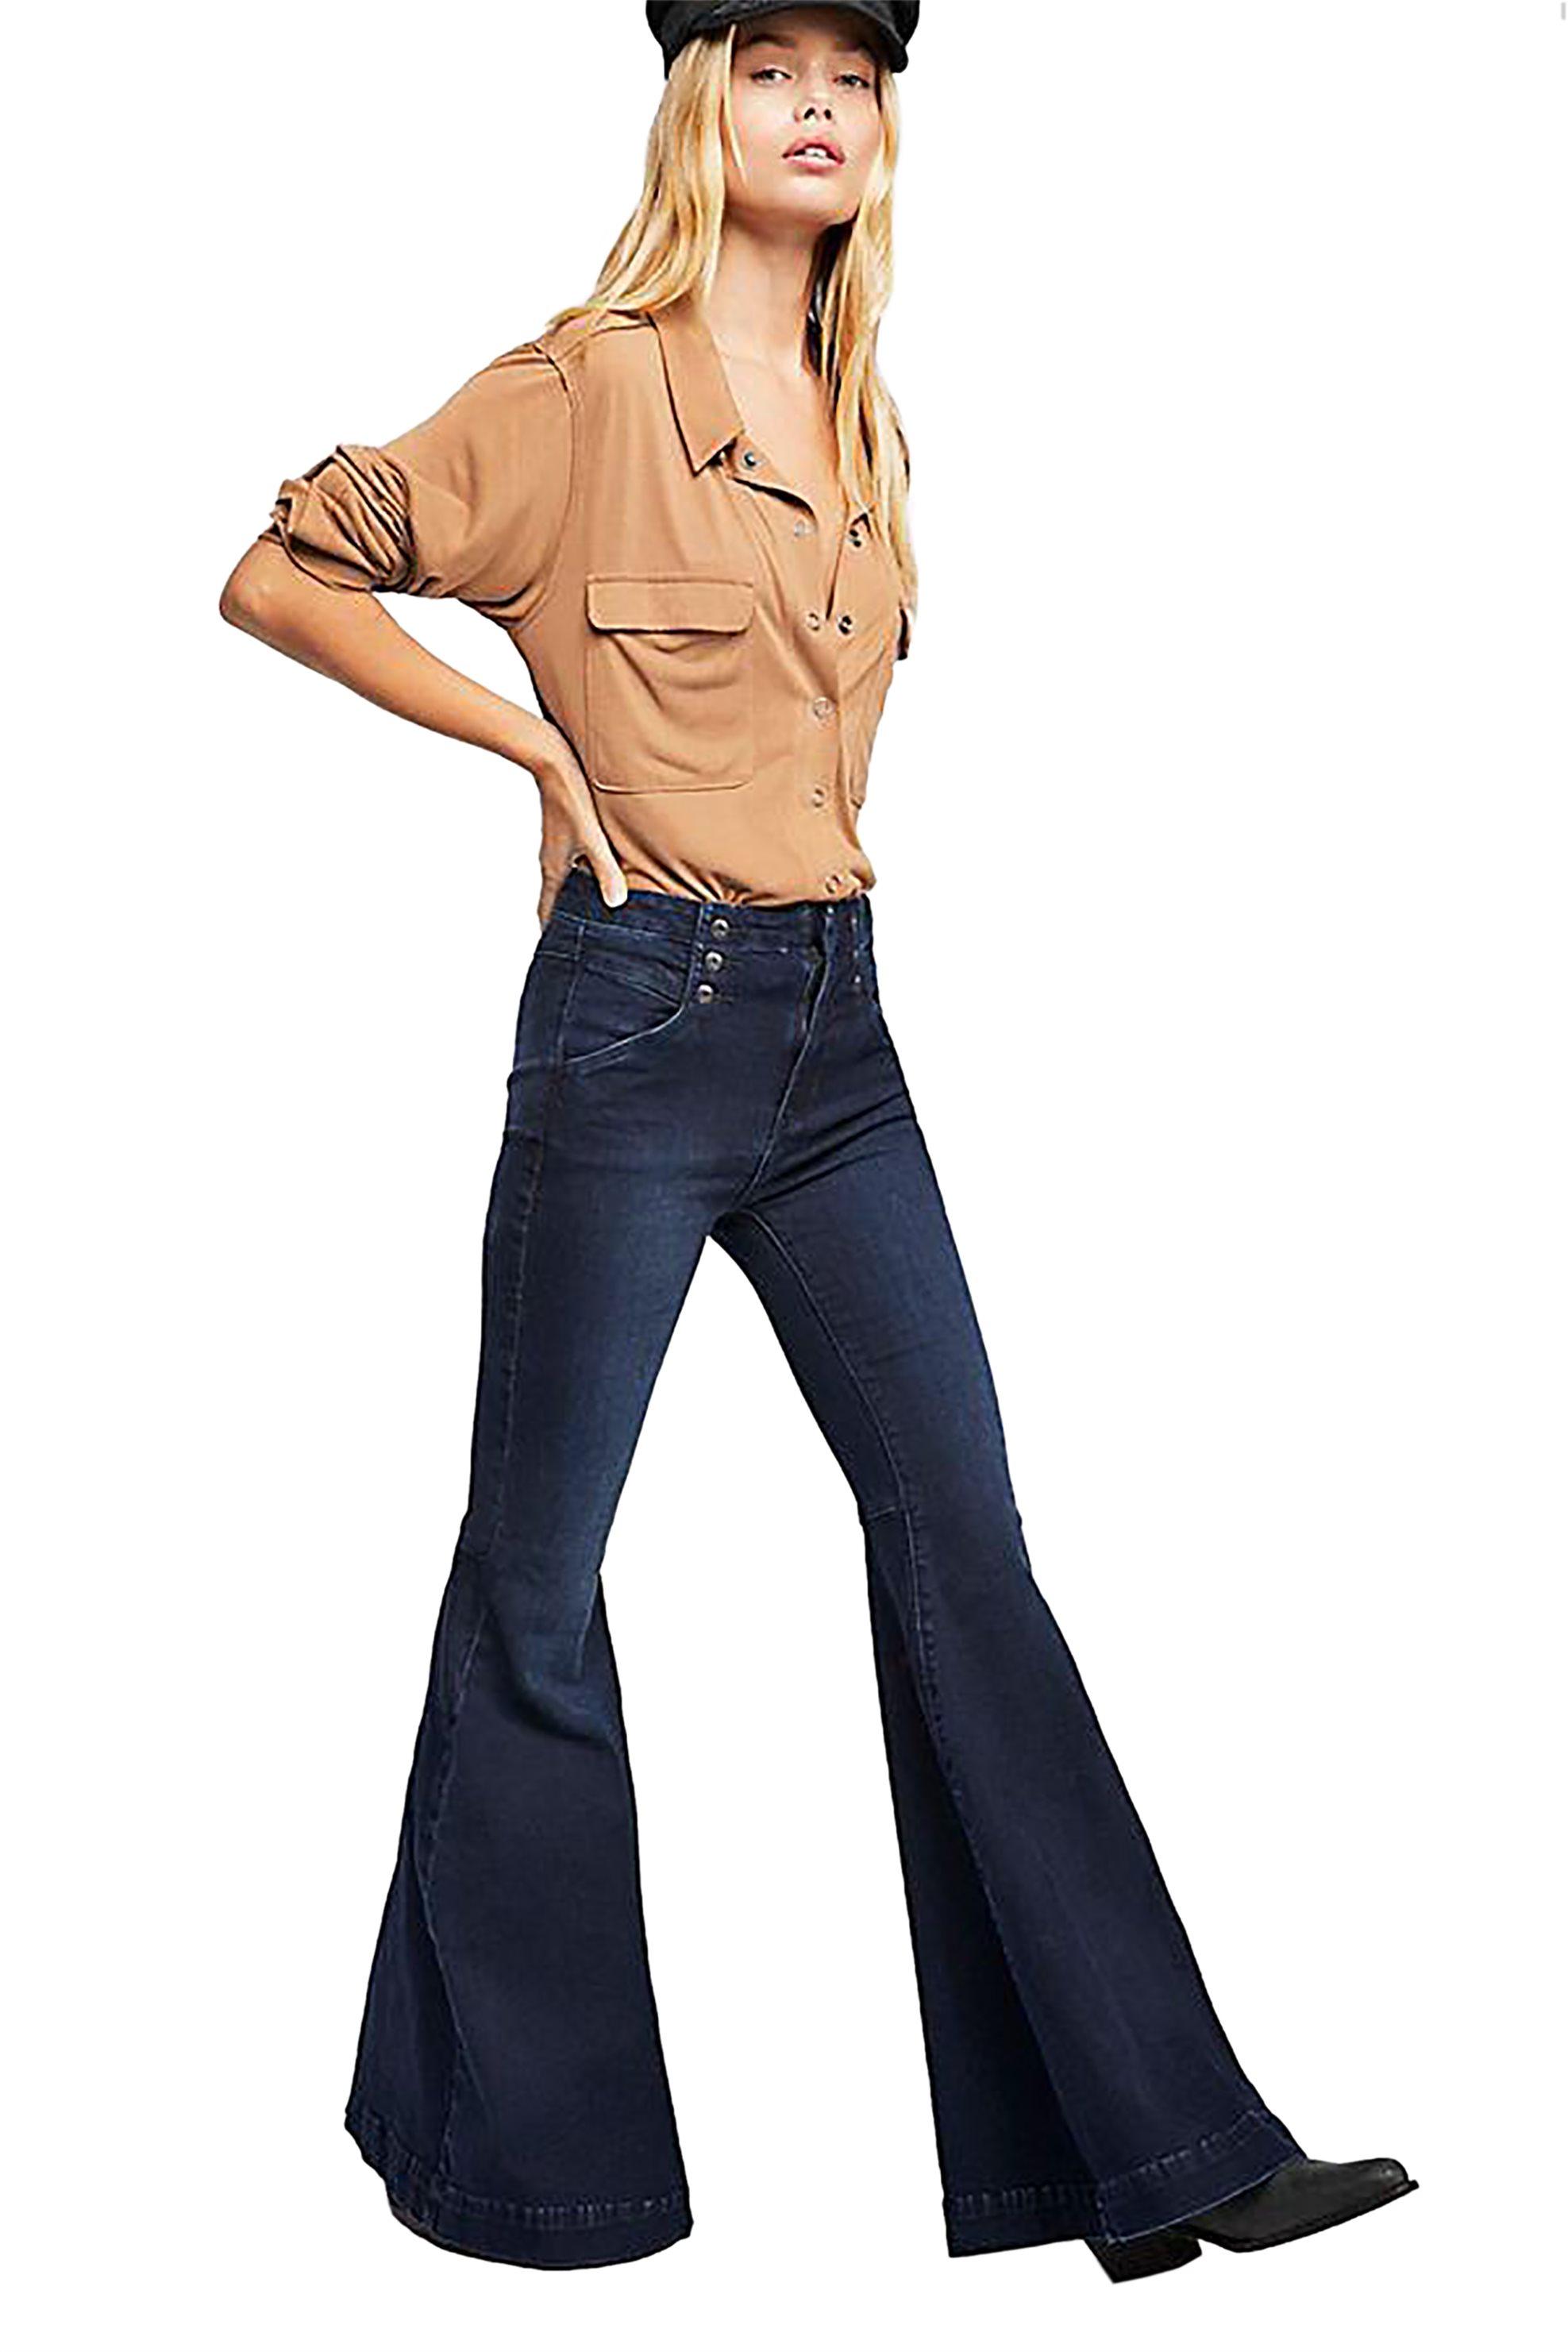 893fe82f660 Καμπάνα | Γυναικεία Παντελόνια (Ταξινόμηση: Δημοφιλέστερα) | Σελίδα ...